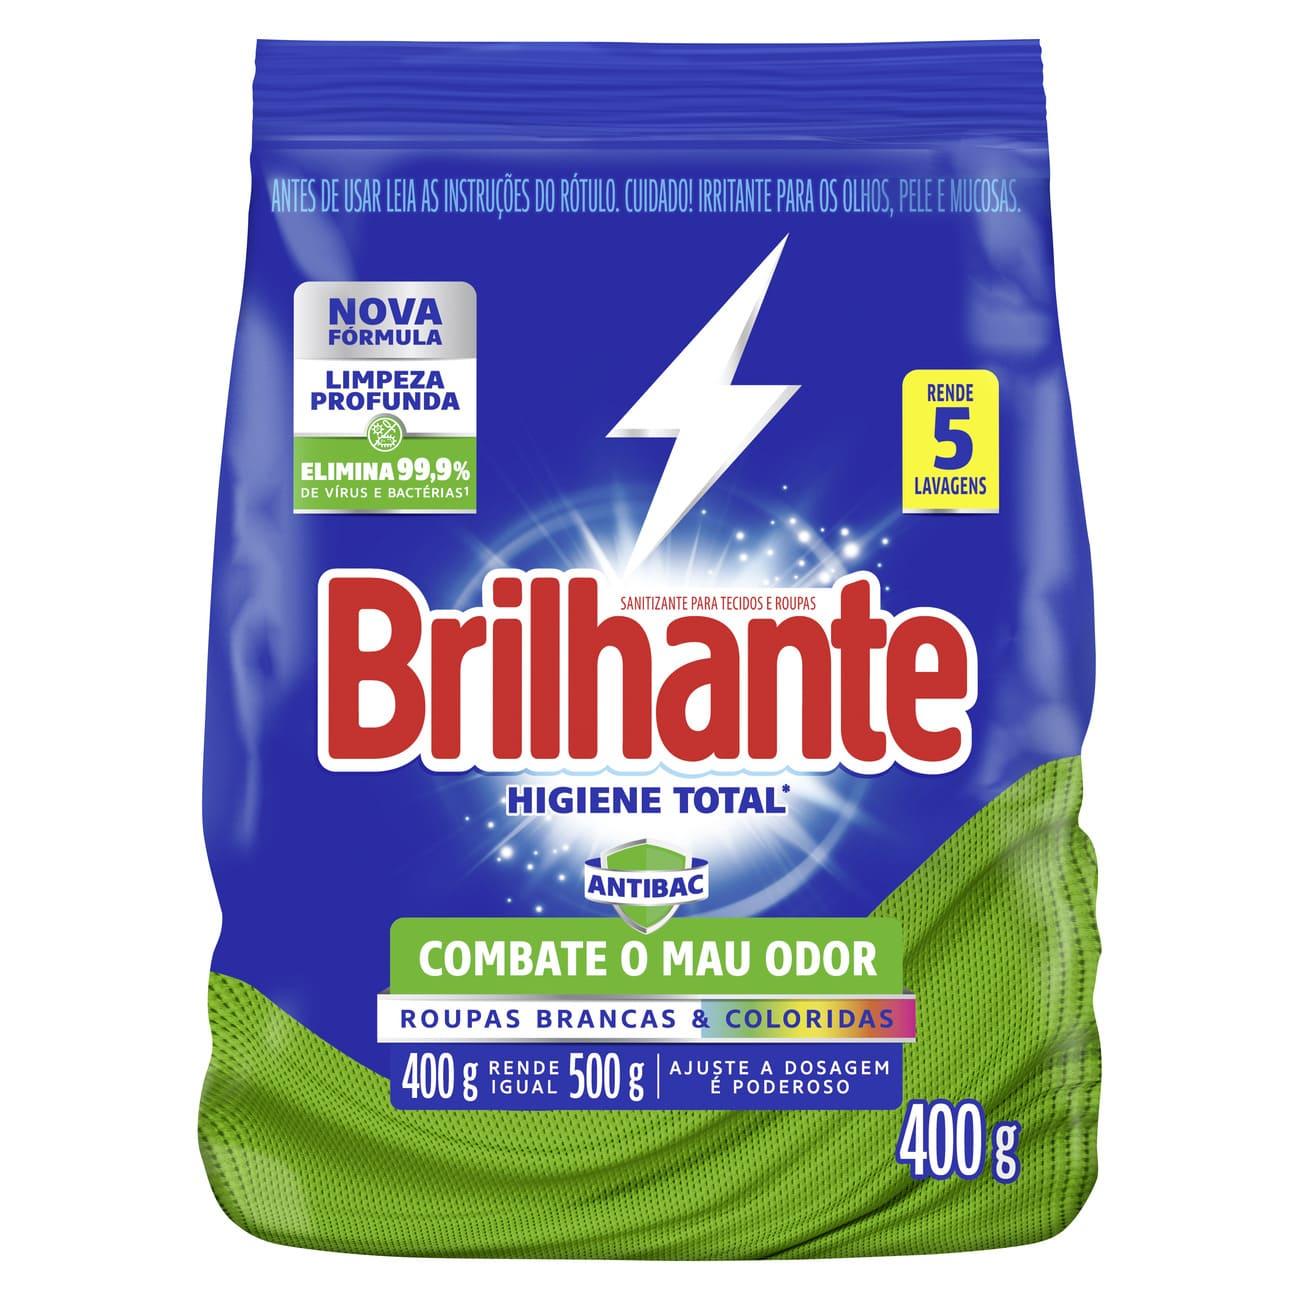 Lava-Roupas em Pó Brilhante  Sanitizante Roupas Brancas e Coloridas Higiene Total Pacote 400g